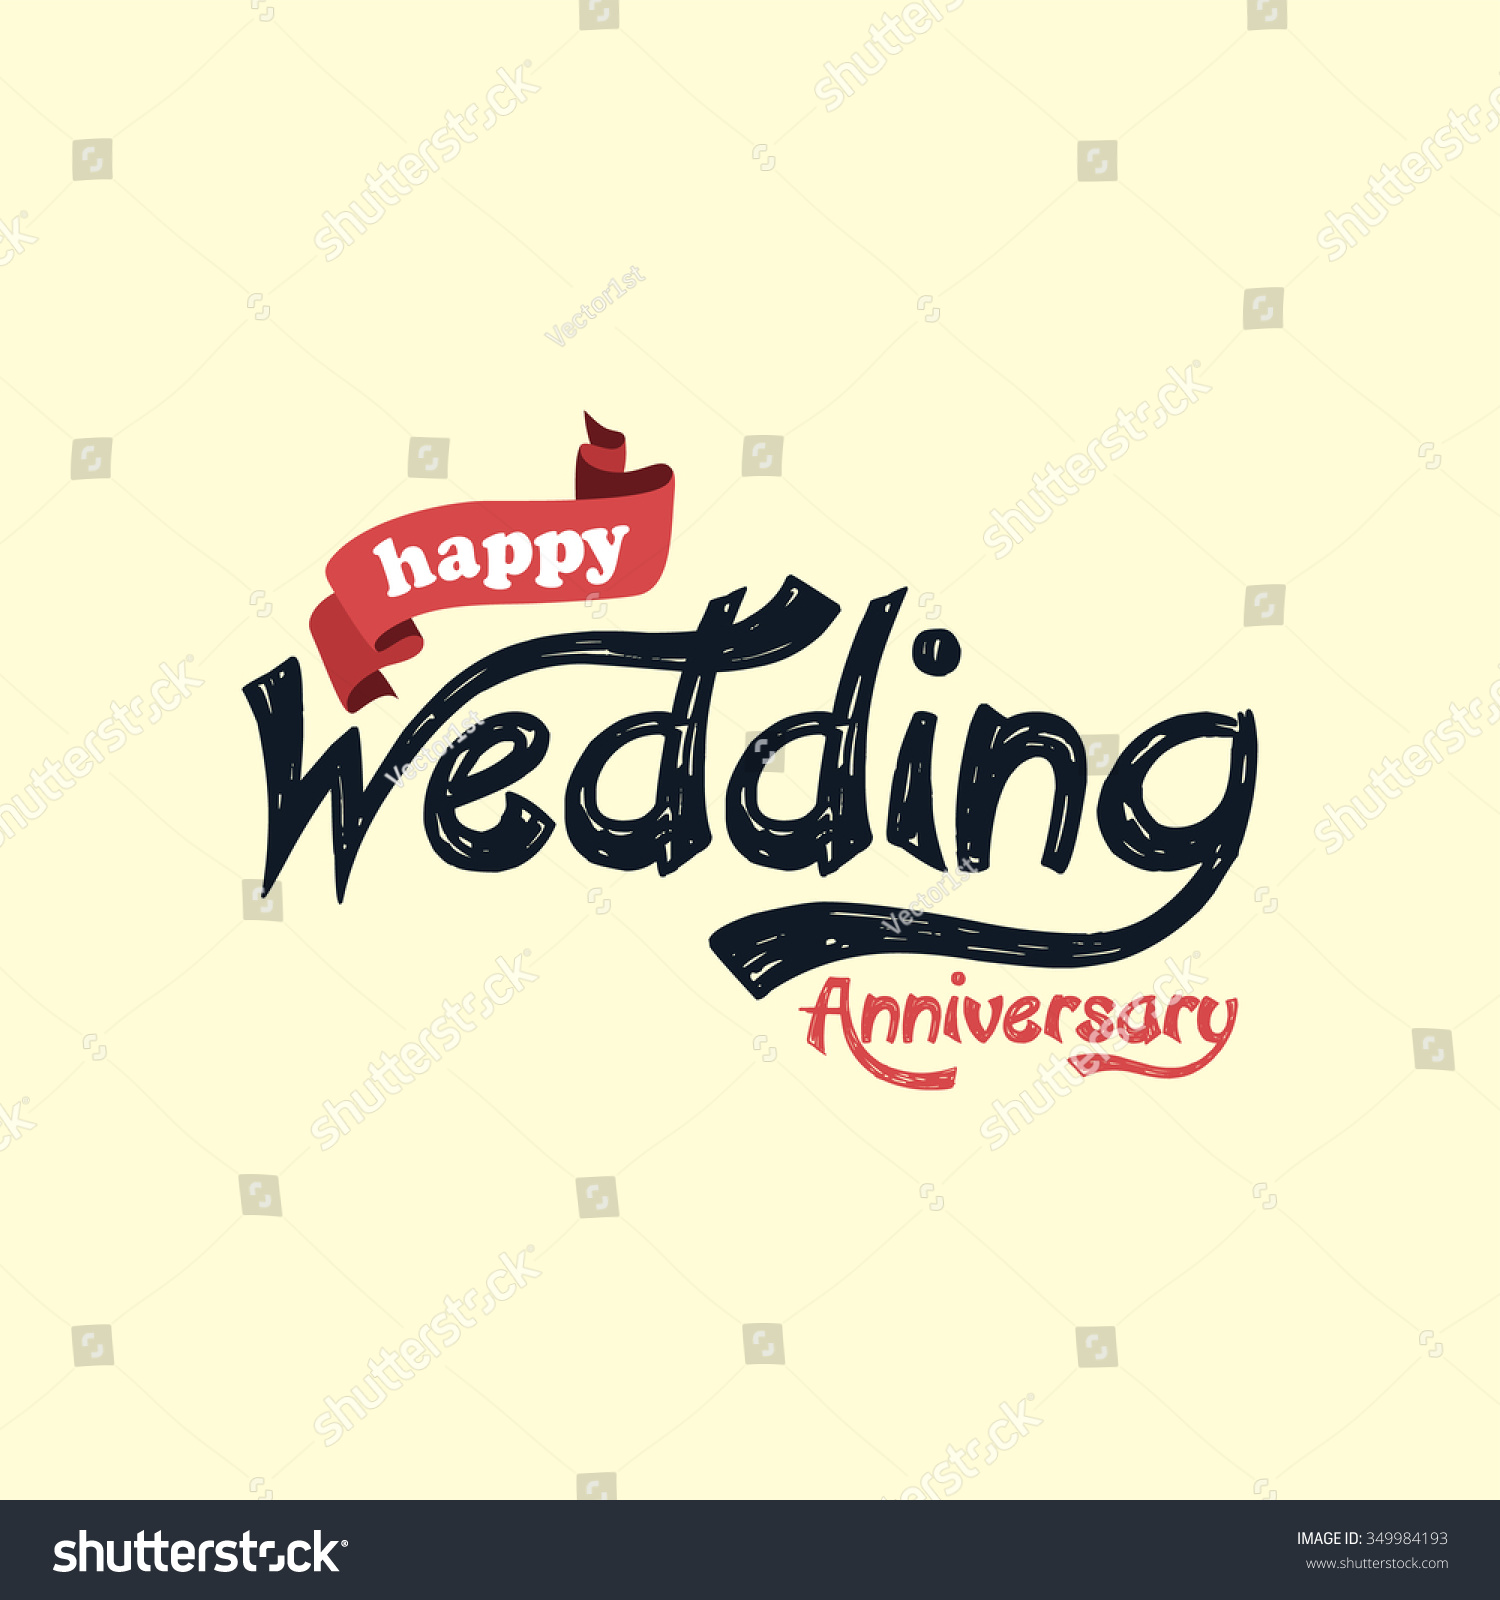 Happy Wedding Anniversary Theme Vector Art Stock Vector 349984193